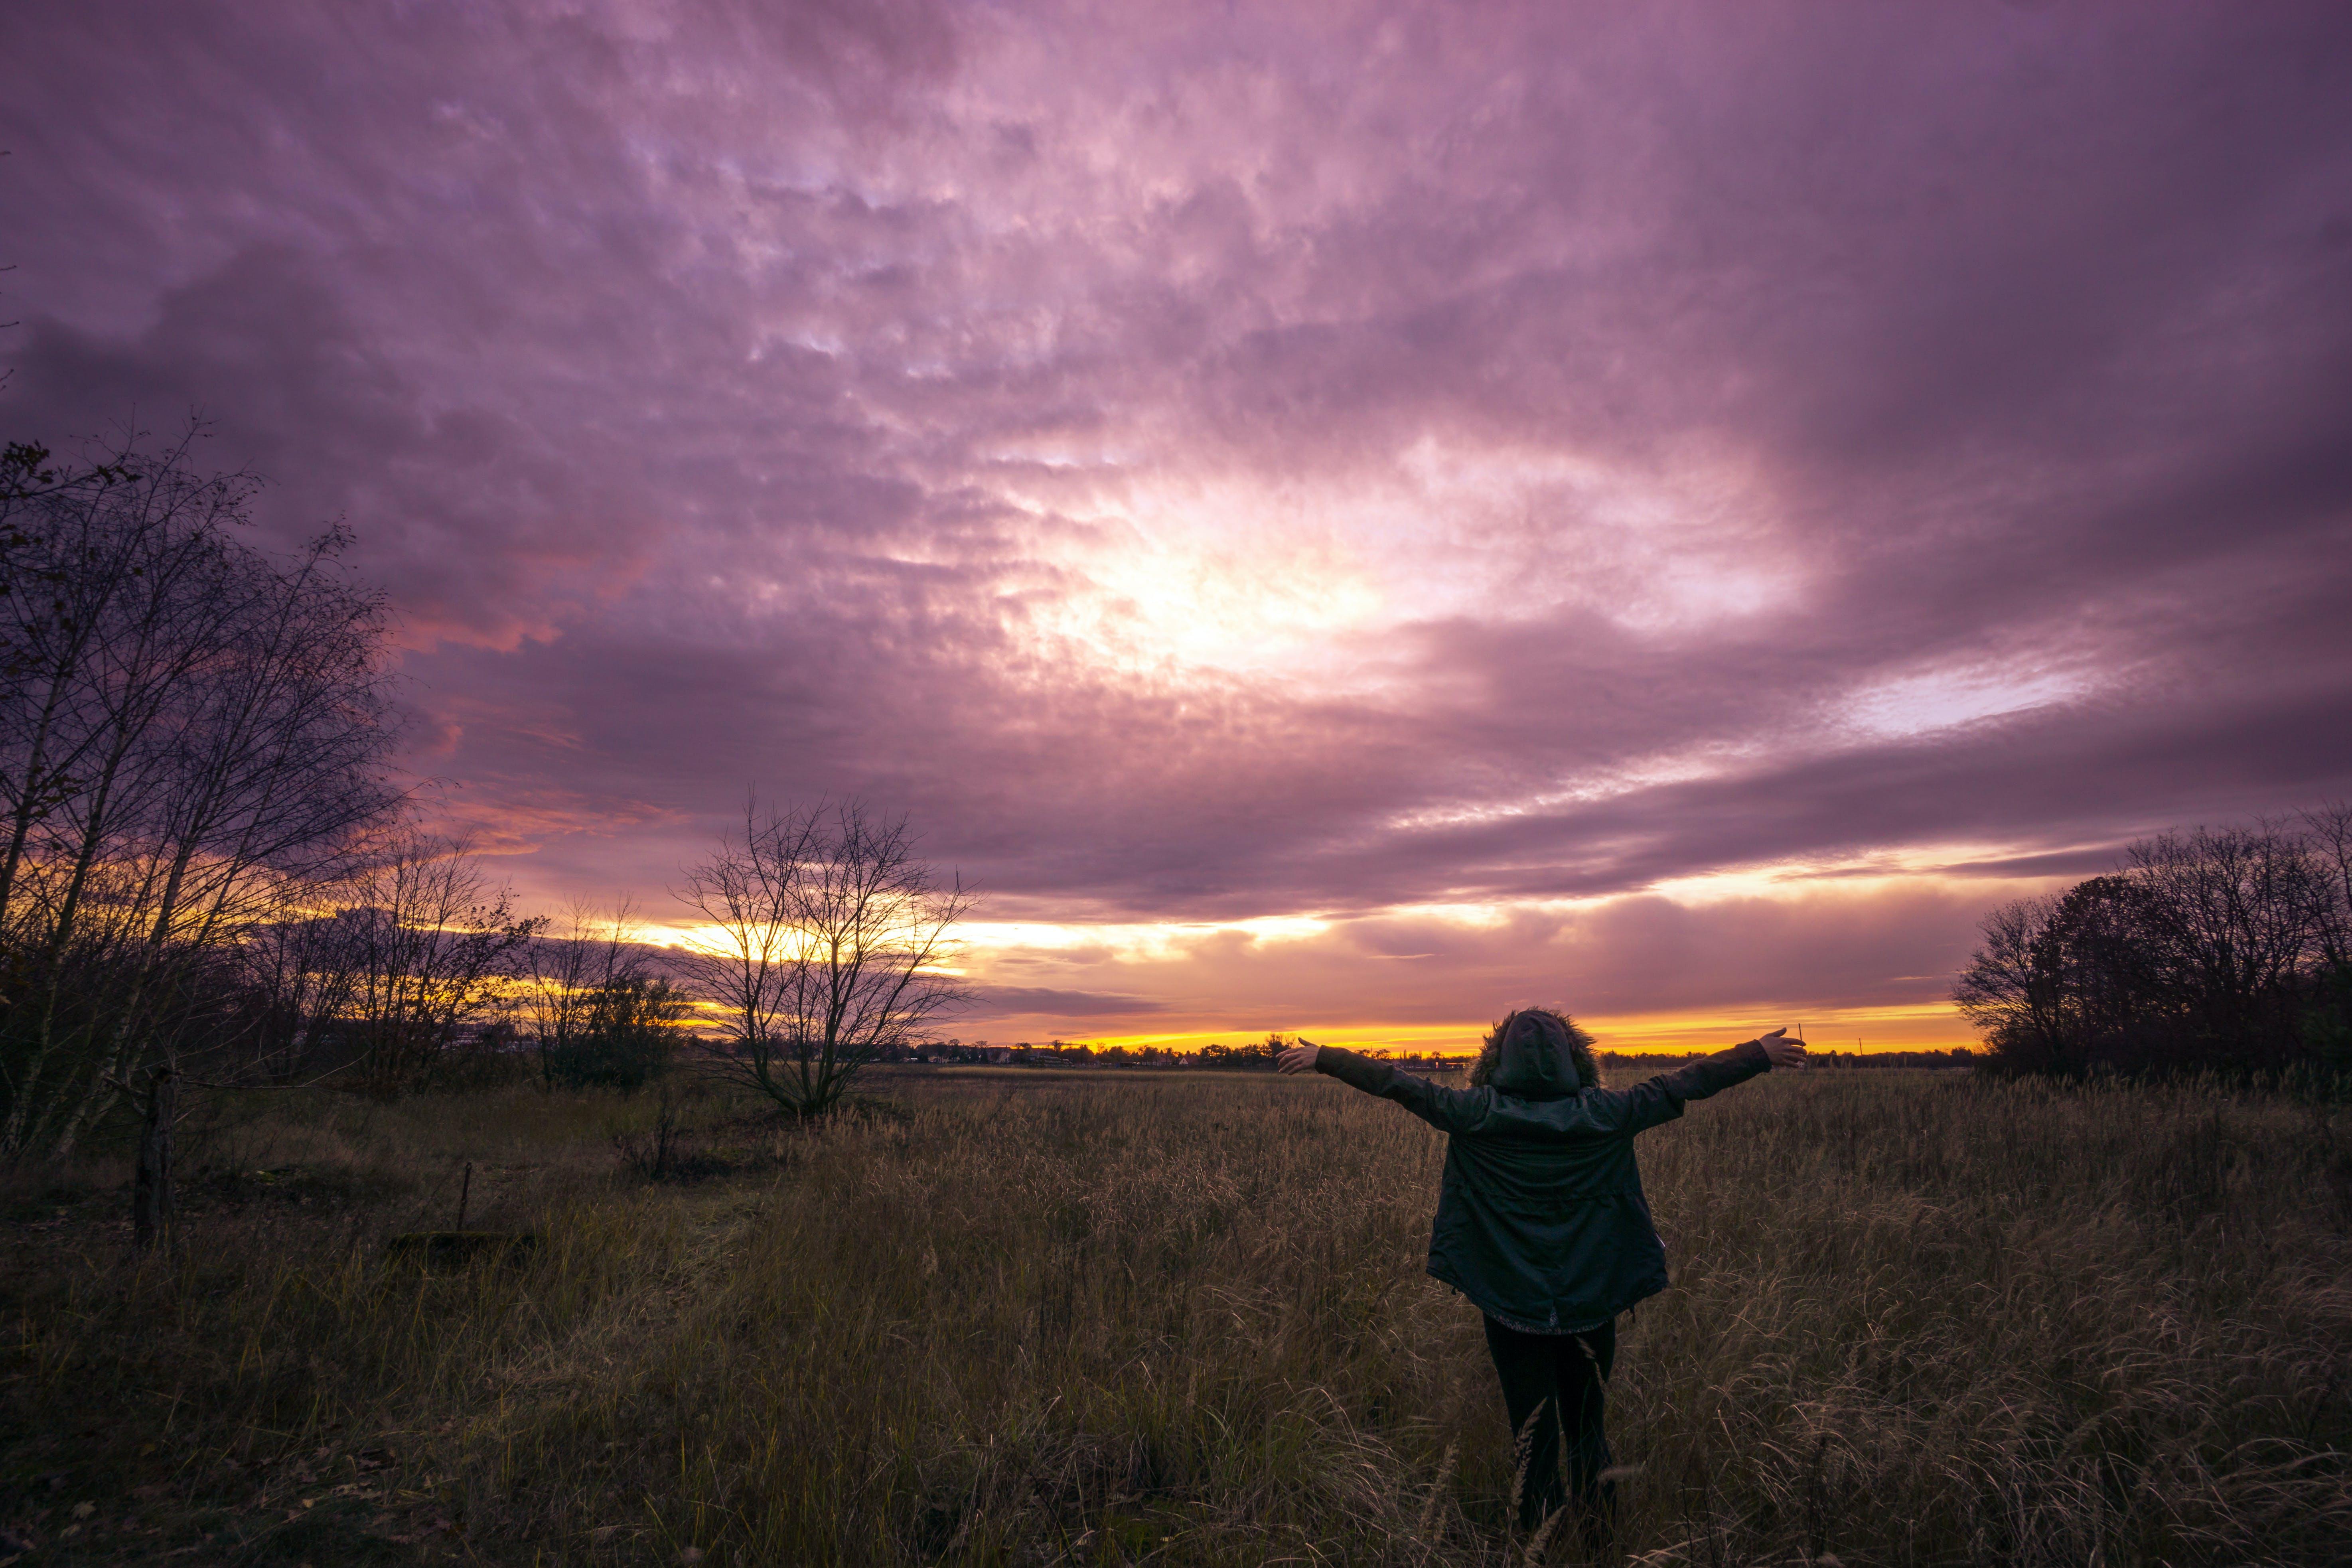 Girl Walking on Field Under Golden Hour